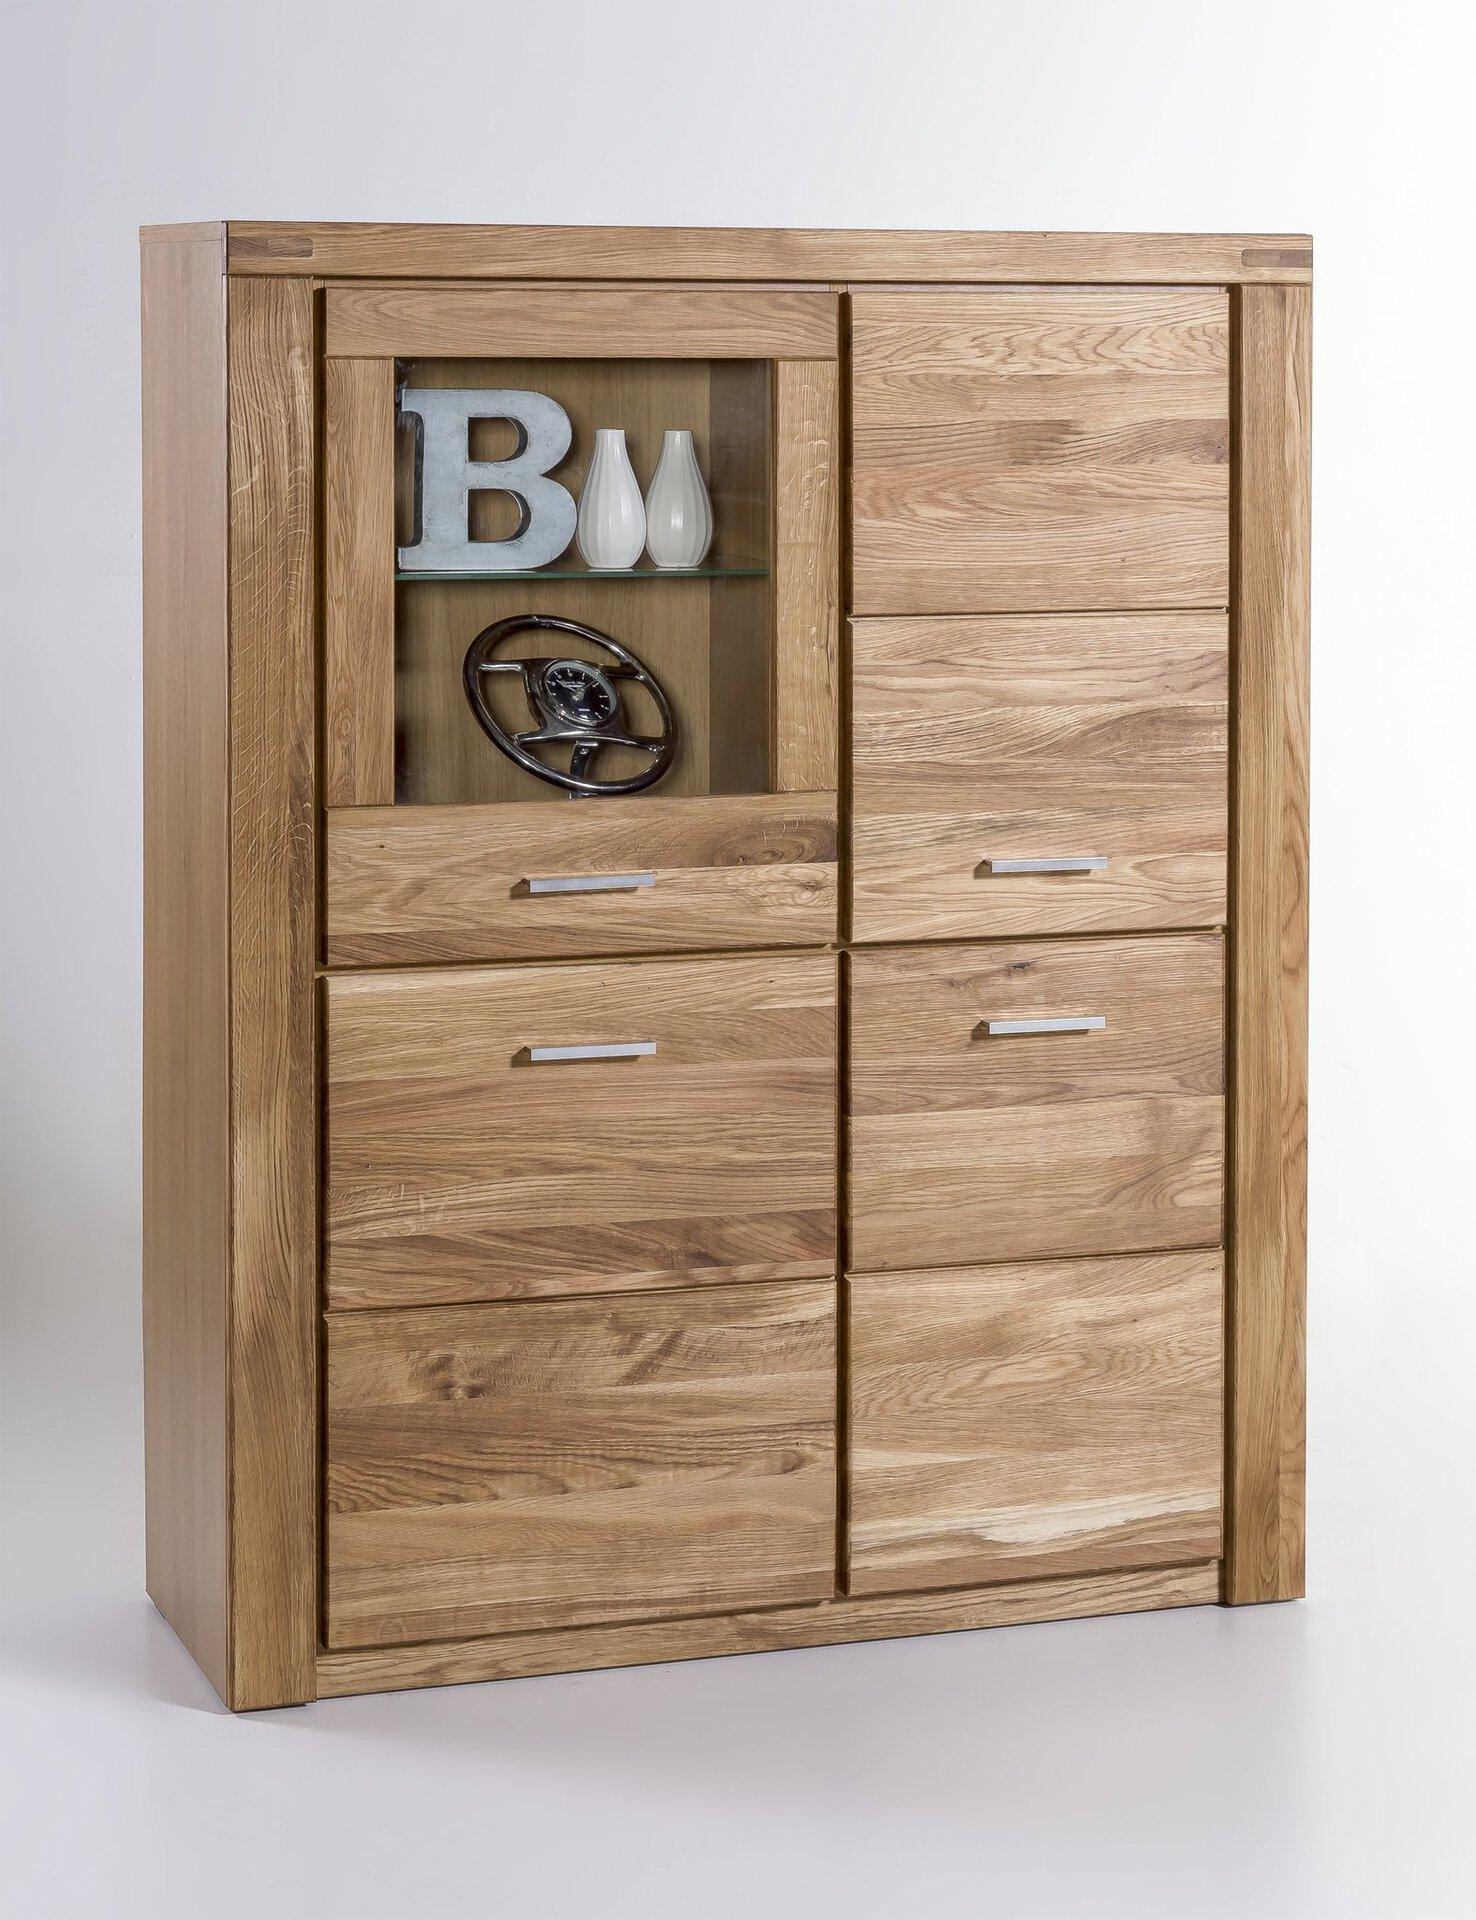 Vitrine TABEA CELECT Holz braun 40 x 140 x 110 cm